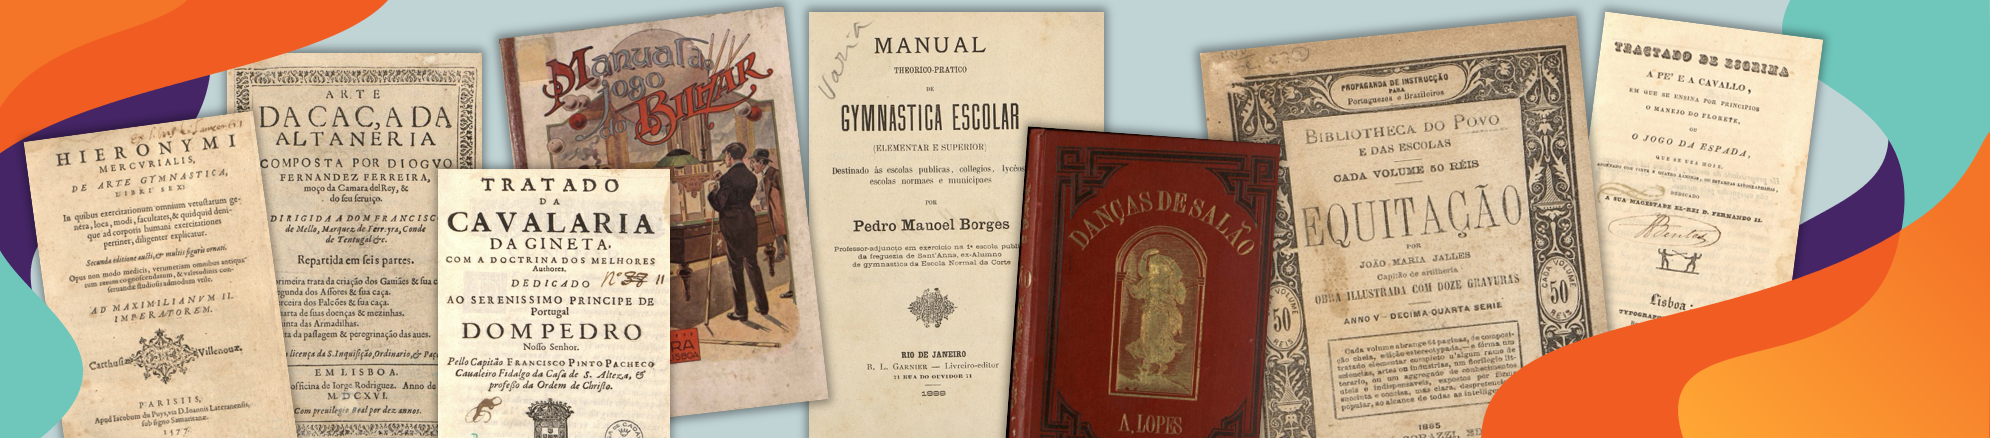 Online digital monographs